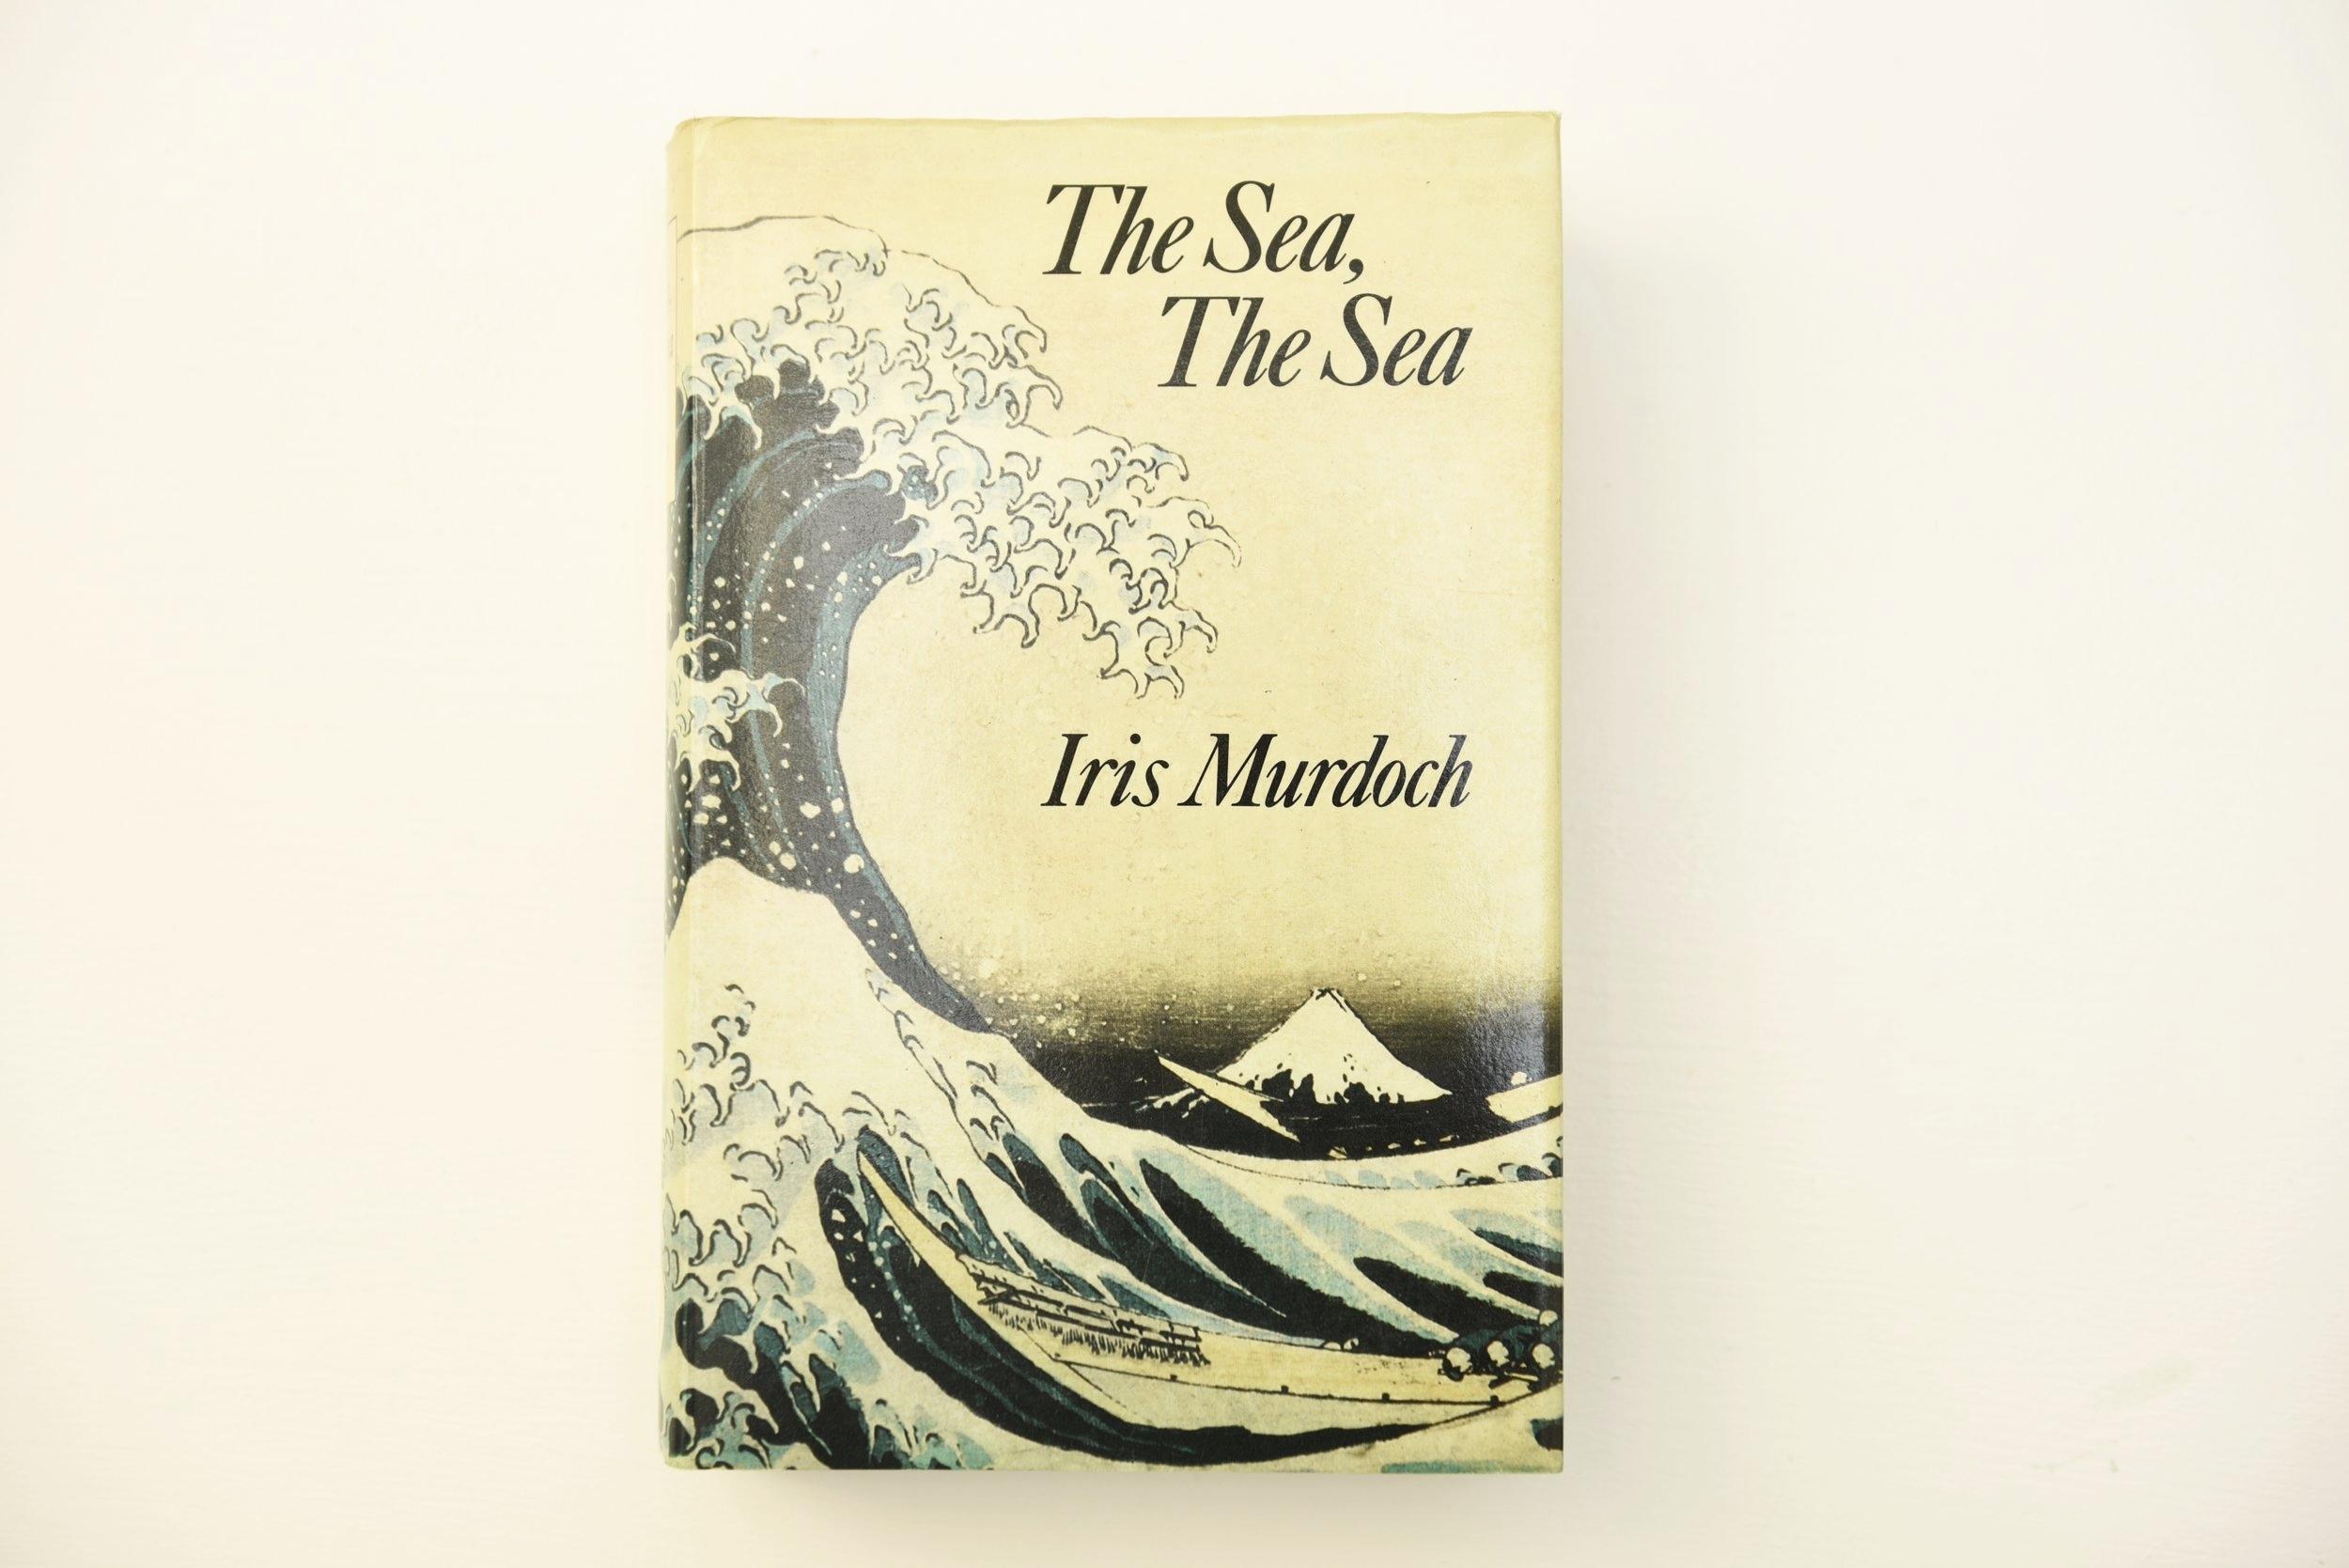 Iris Murdoch, The Sea The Sea